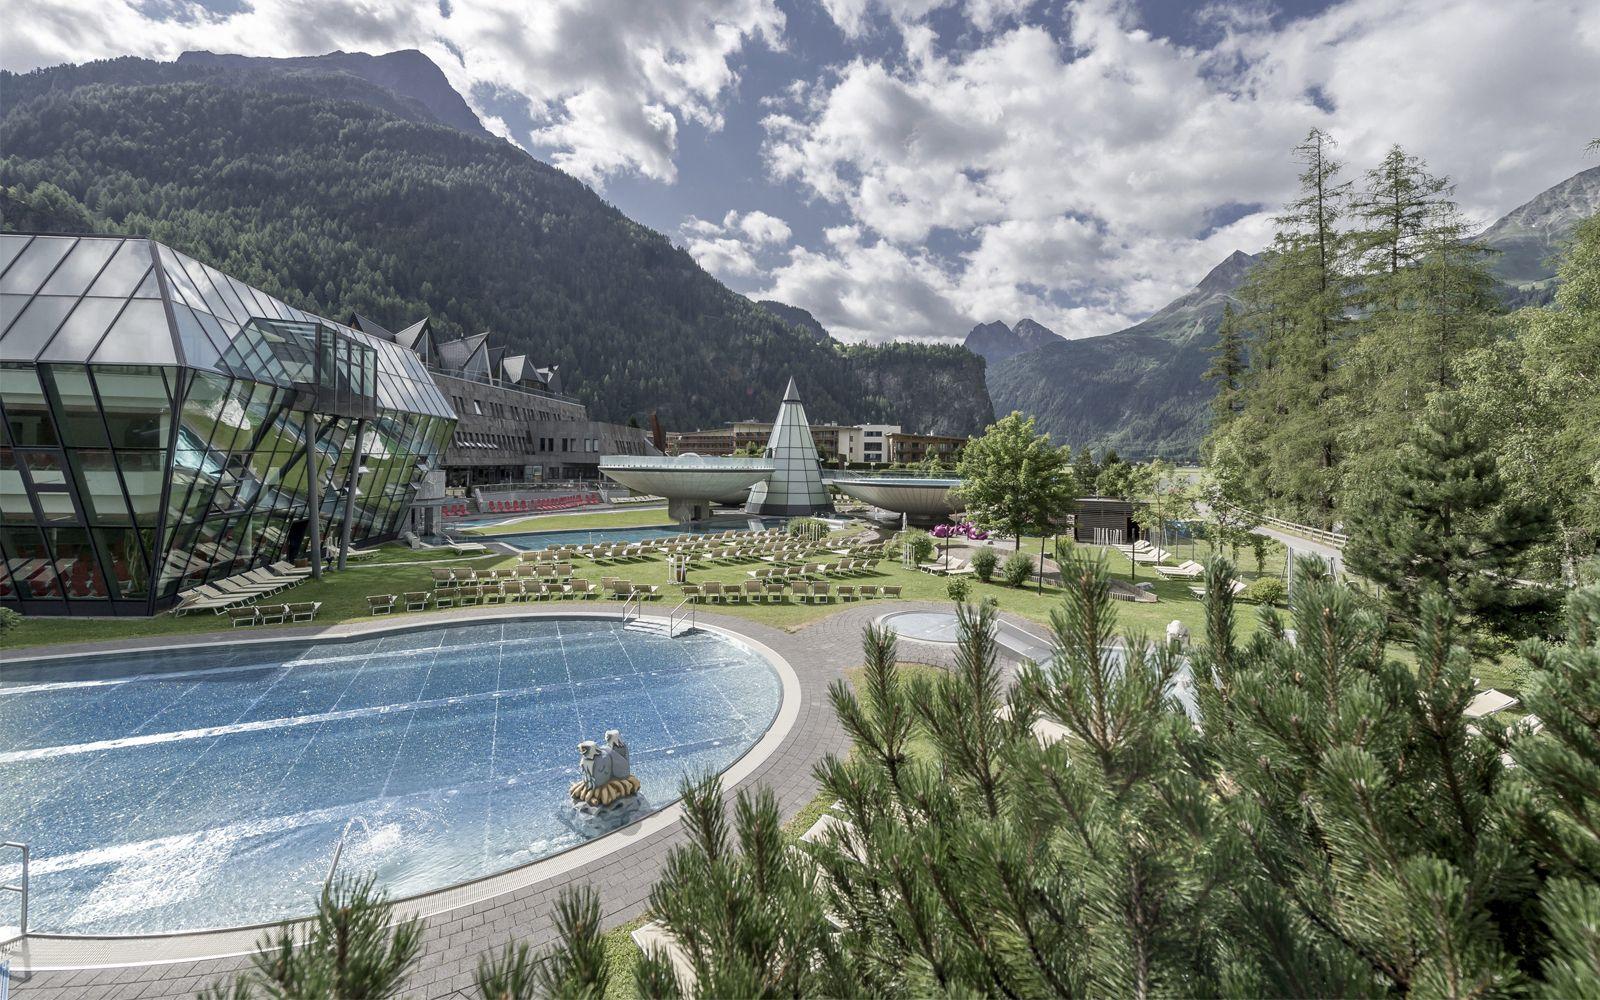 Single-Urlaub mit Kind Offerte e Pacchetti Lngenfeld - bergfex